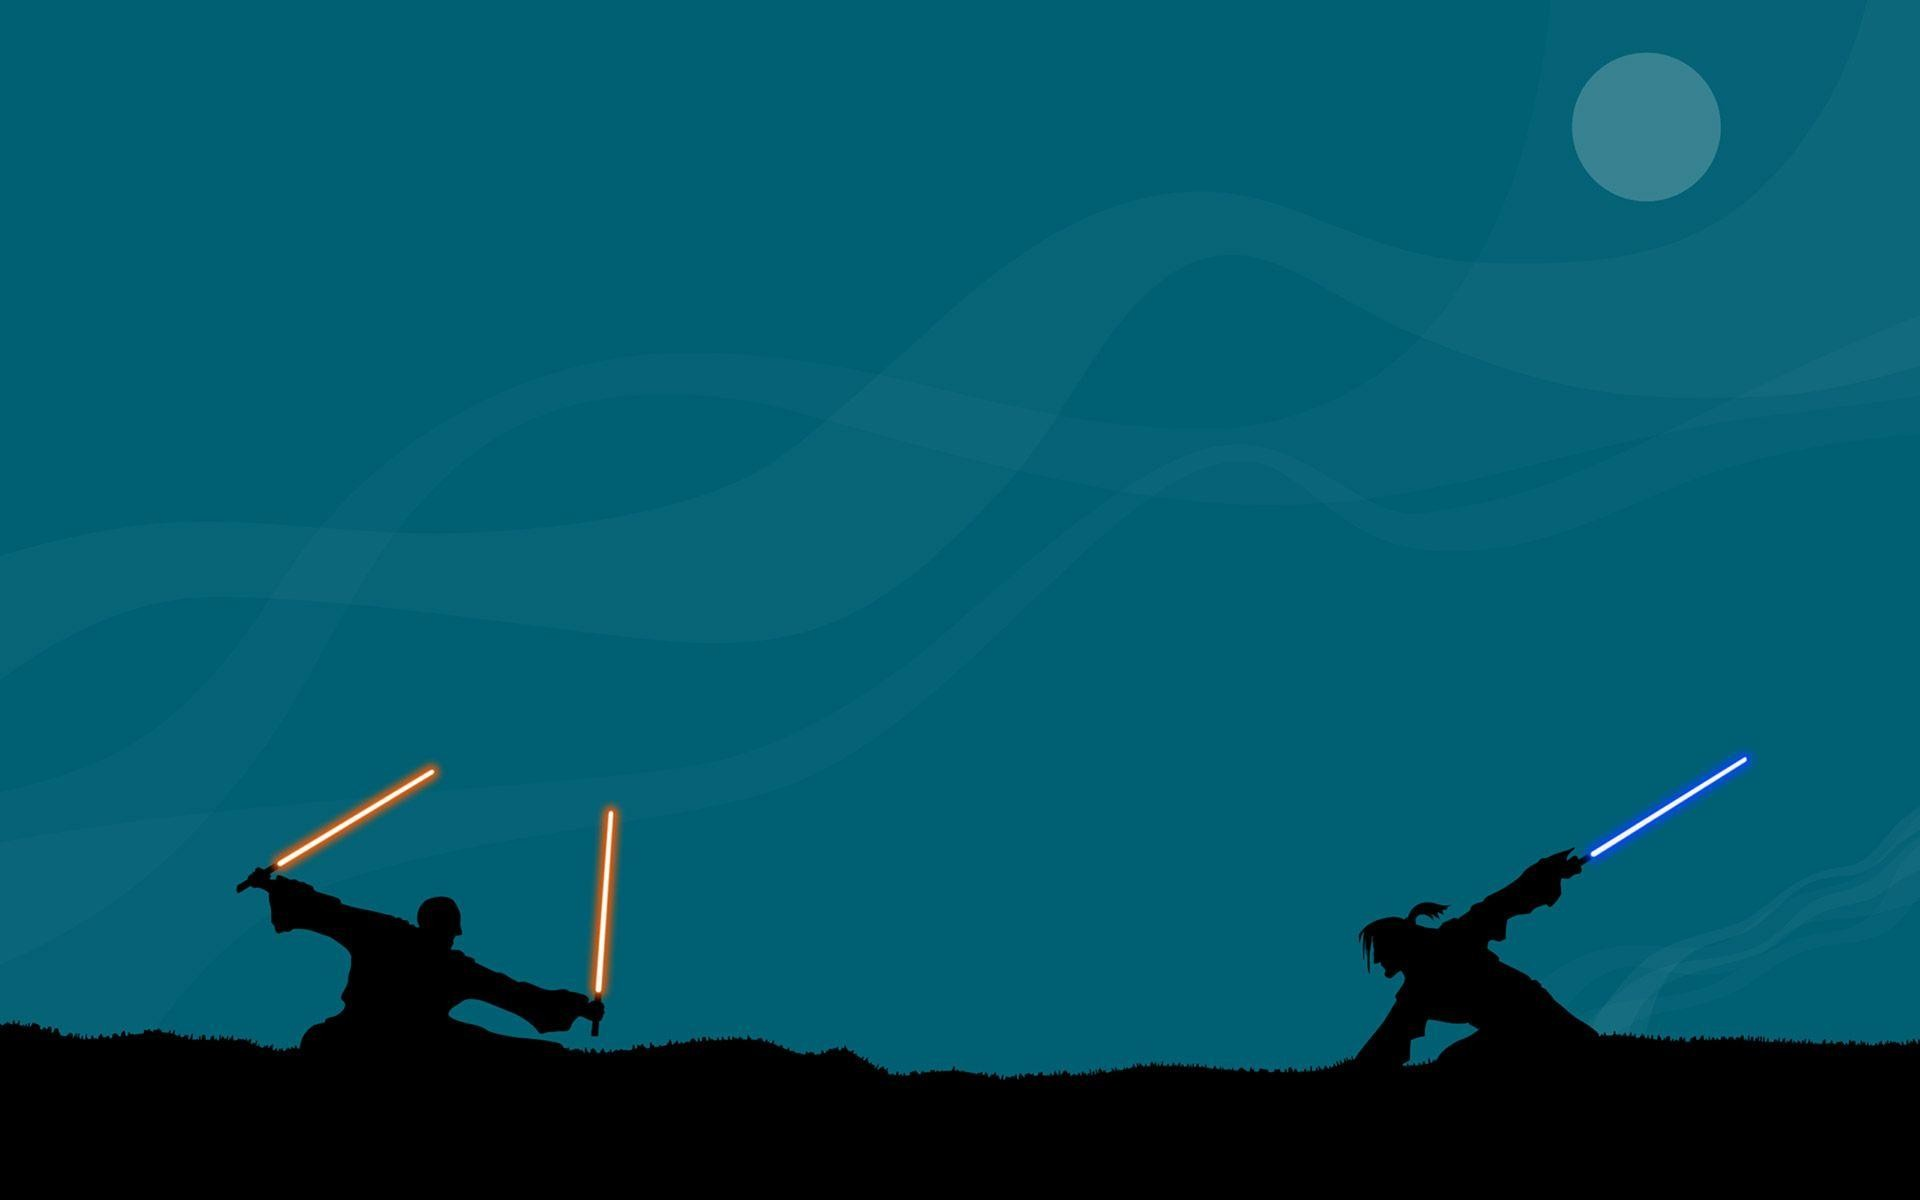 Jedi Wallpapers – Full HD wallpaper search